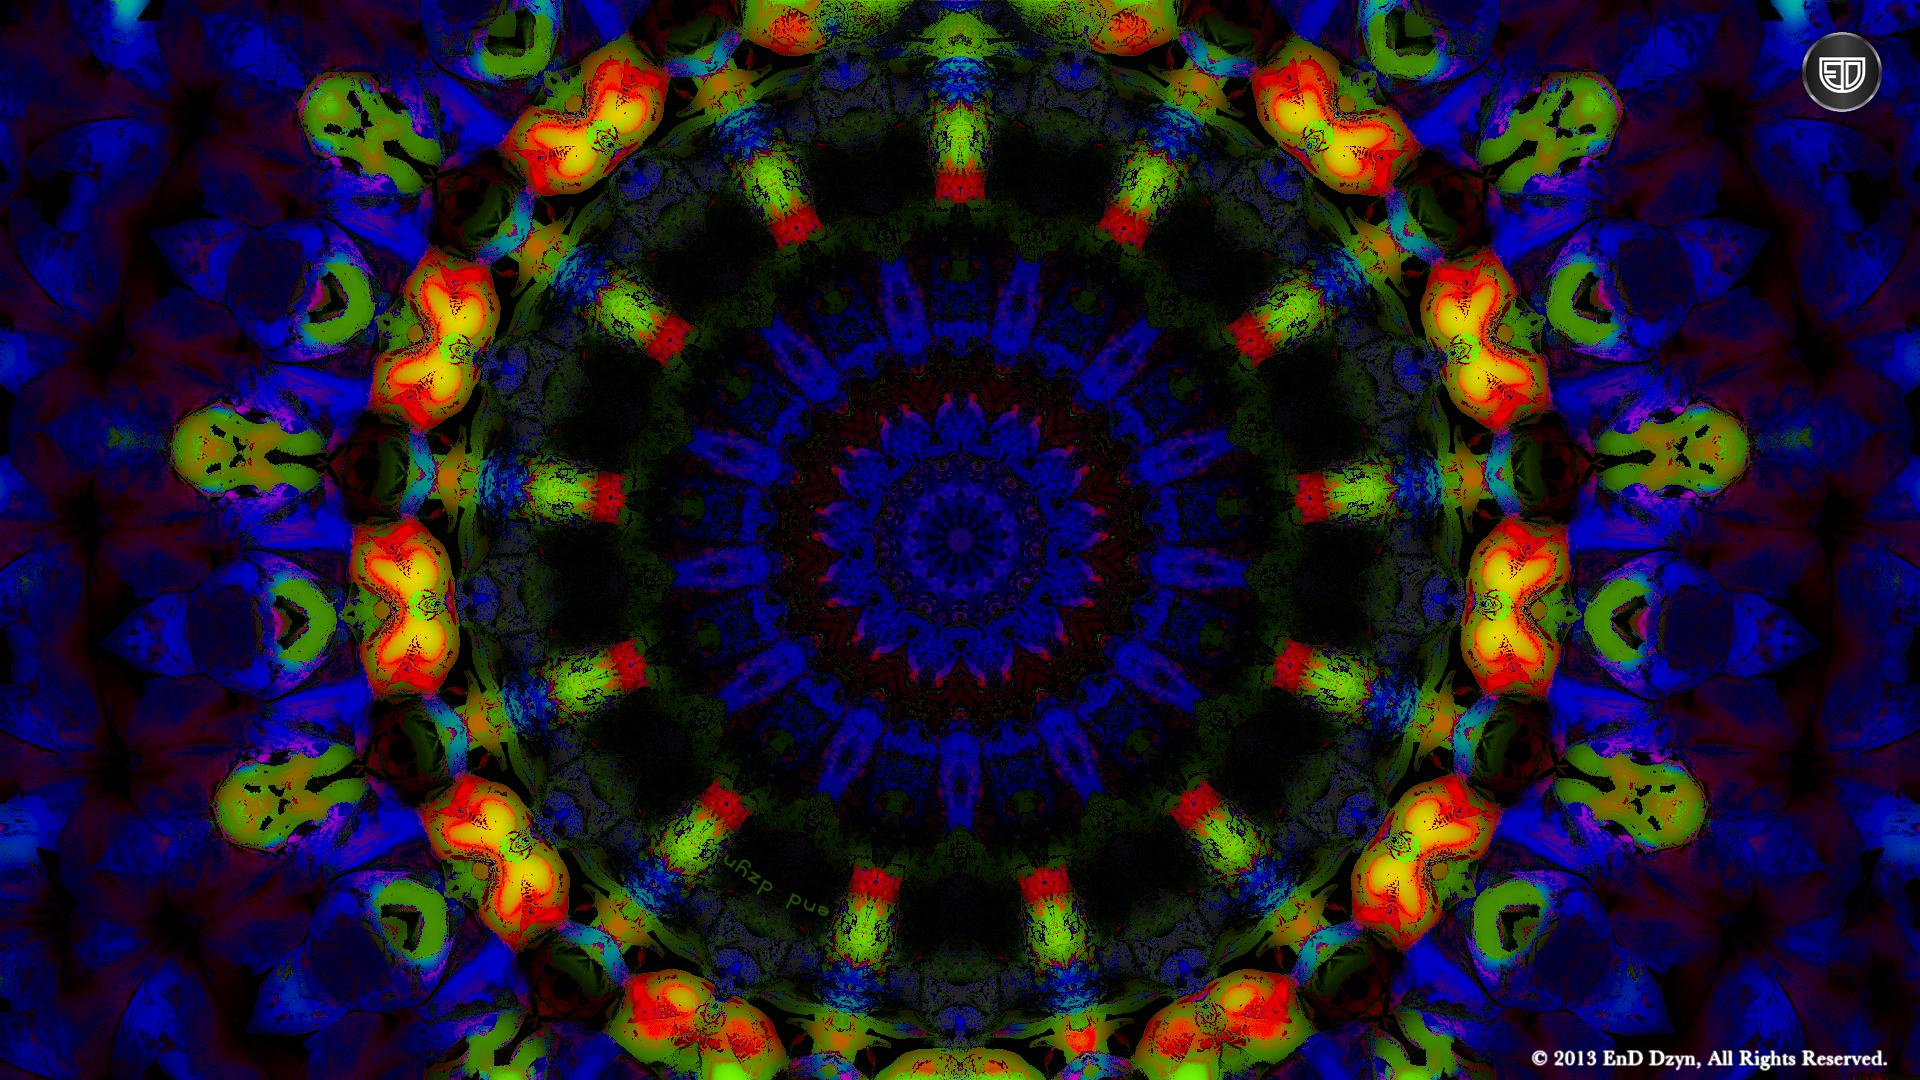 Psychedelic HD Background Wallpaper Blue Orange Trippy 3D 1920x1080